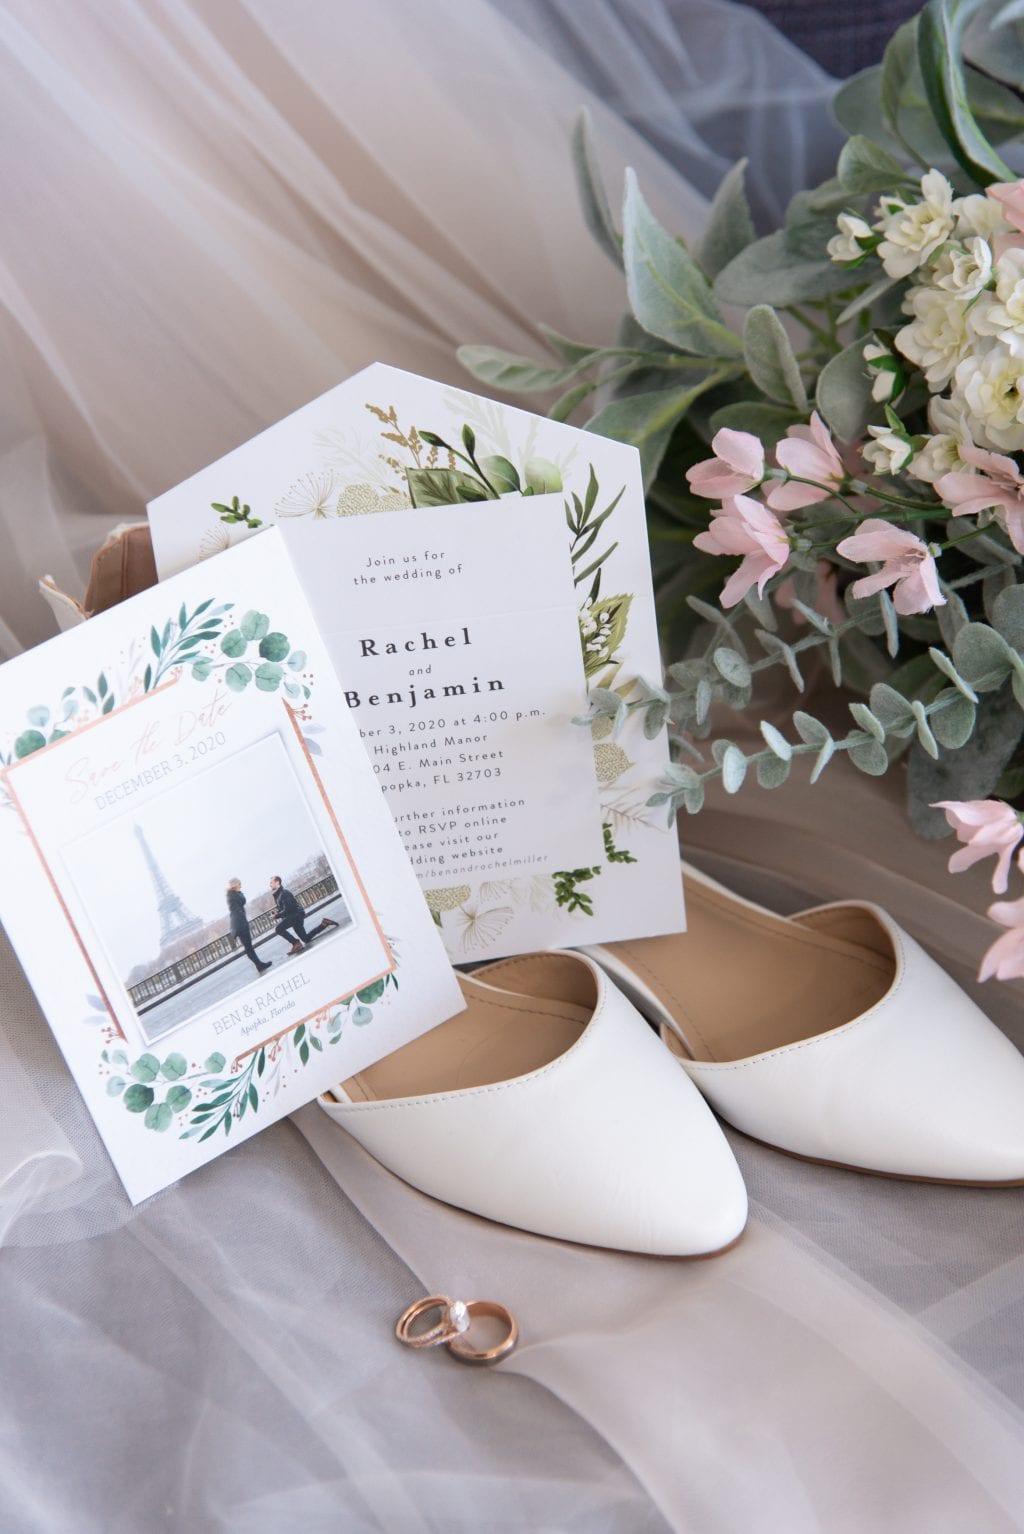 Apopka Wedding Invitation Photo Inspiration